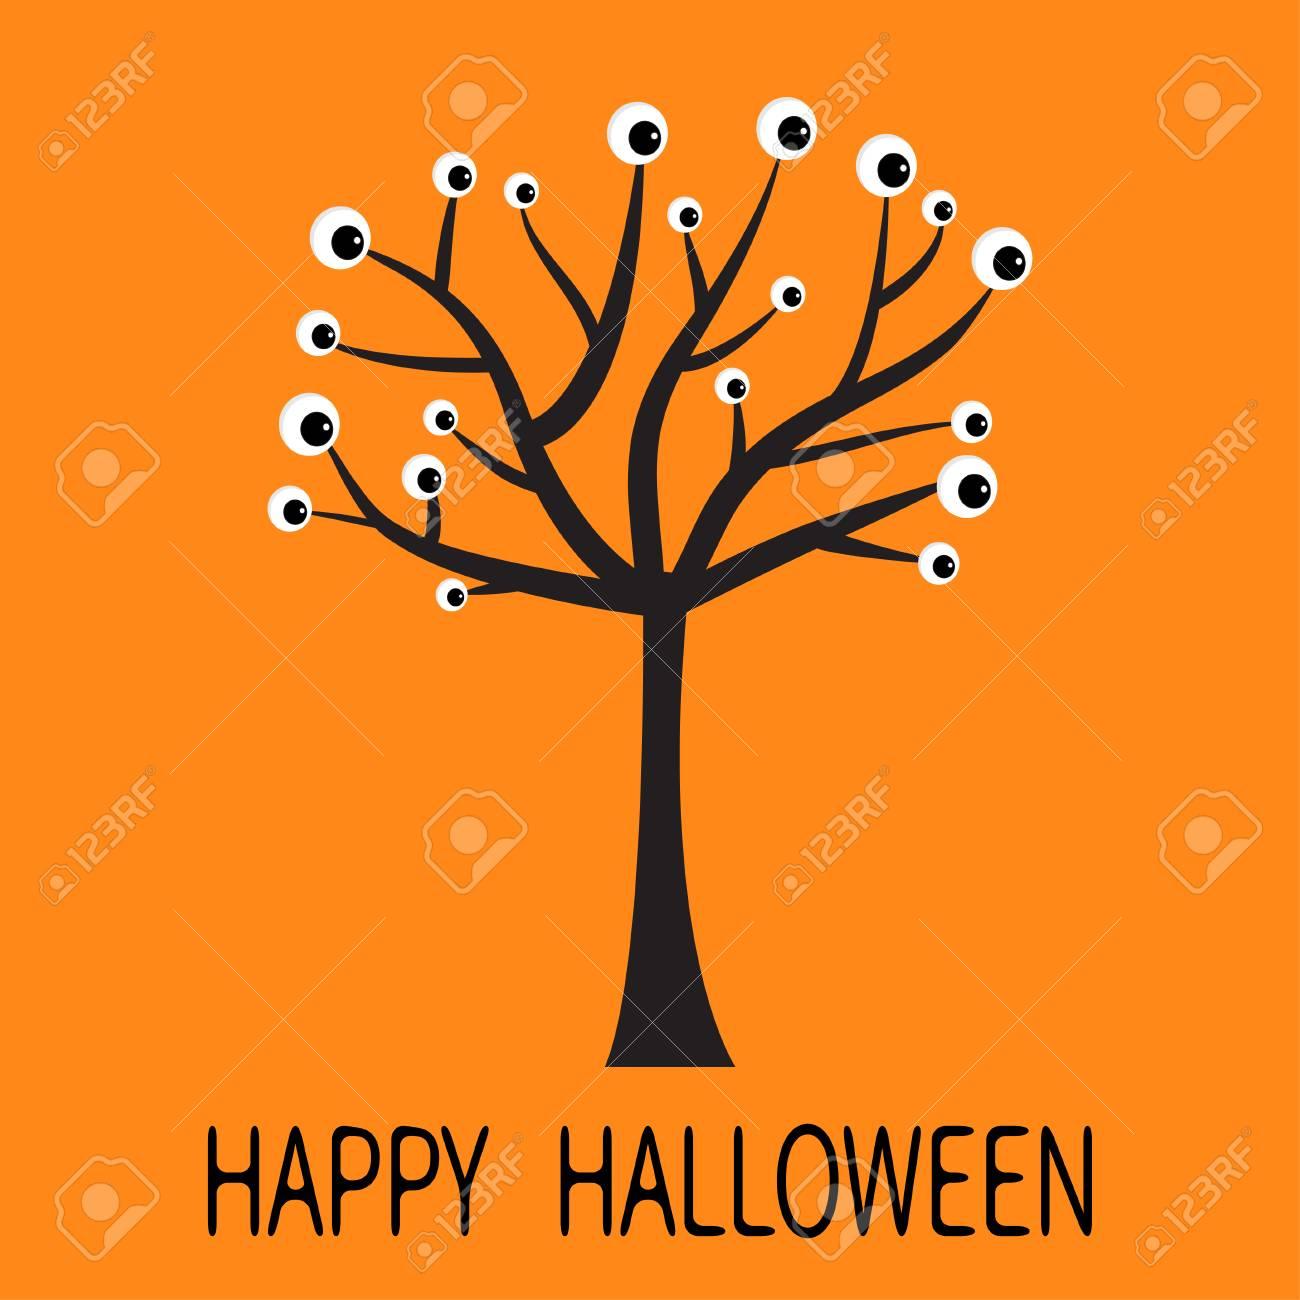 Happy Halloween Greeting Card. Black Tree Silhouette With Eyes. Plant  Branch. Cartoon Eyeball